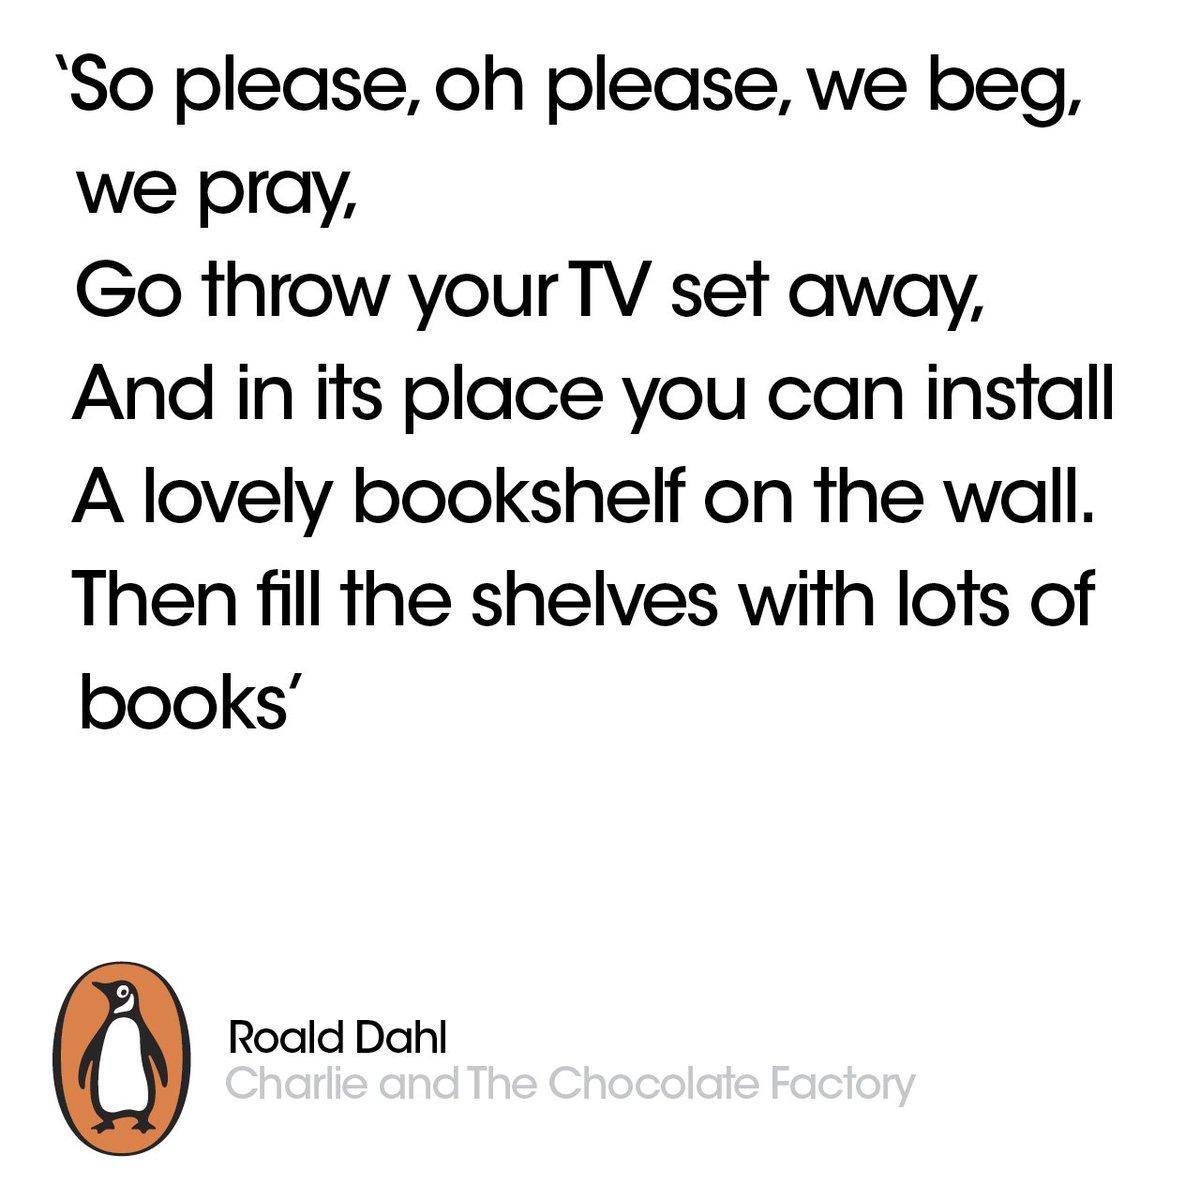 Happy #RoaldDahlDay! https://t.co/PRG5EOfSo2